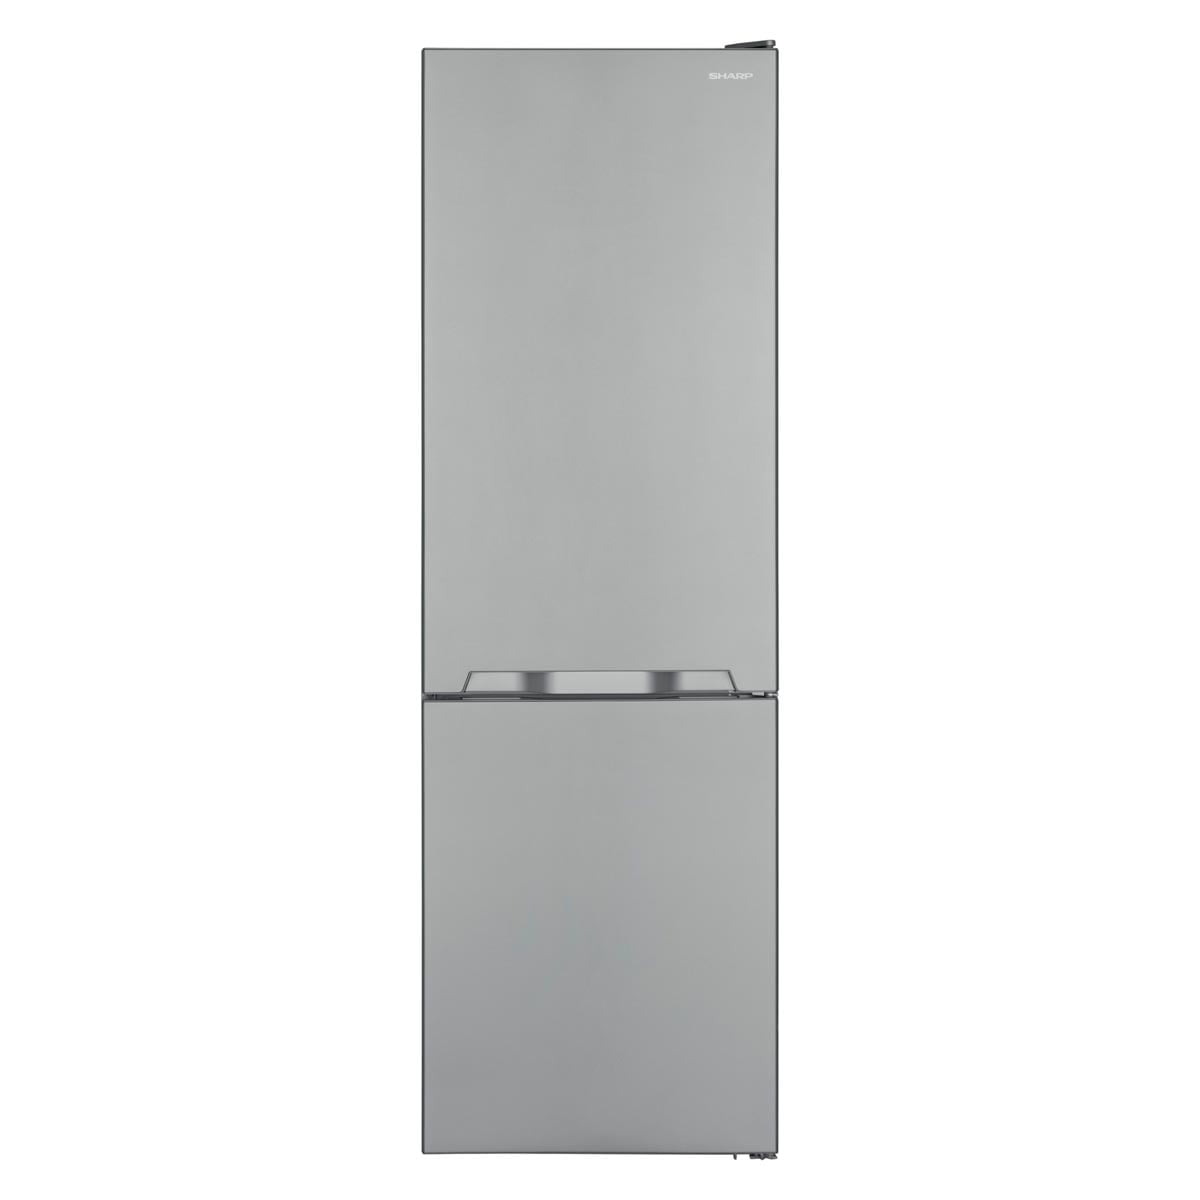 Kombinovani frižider 324 l (208+22+94) - Sharp SJ-BA10IMXI2 napred